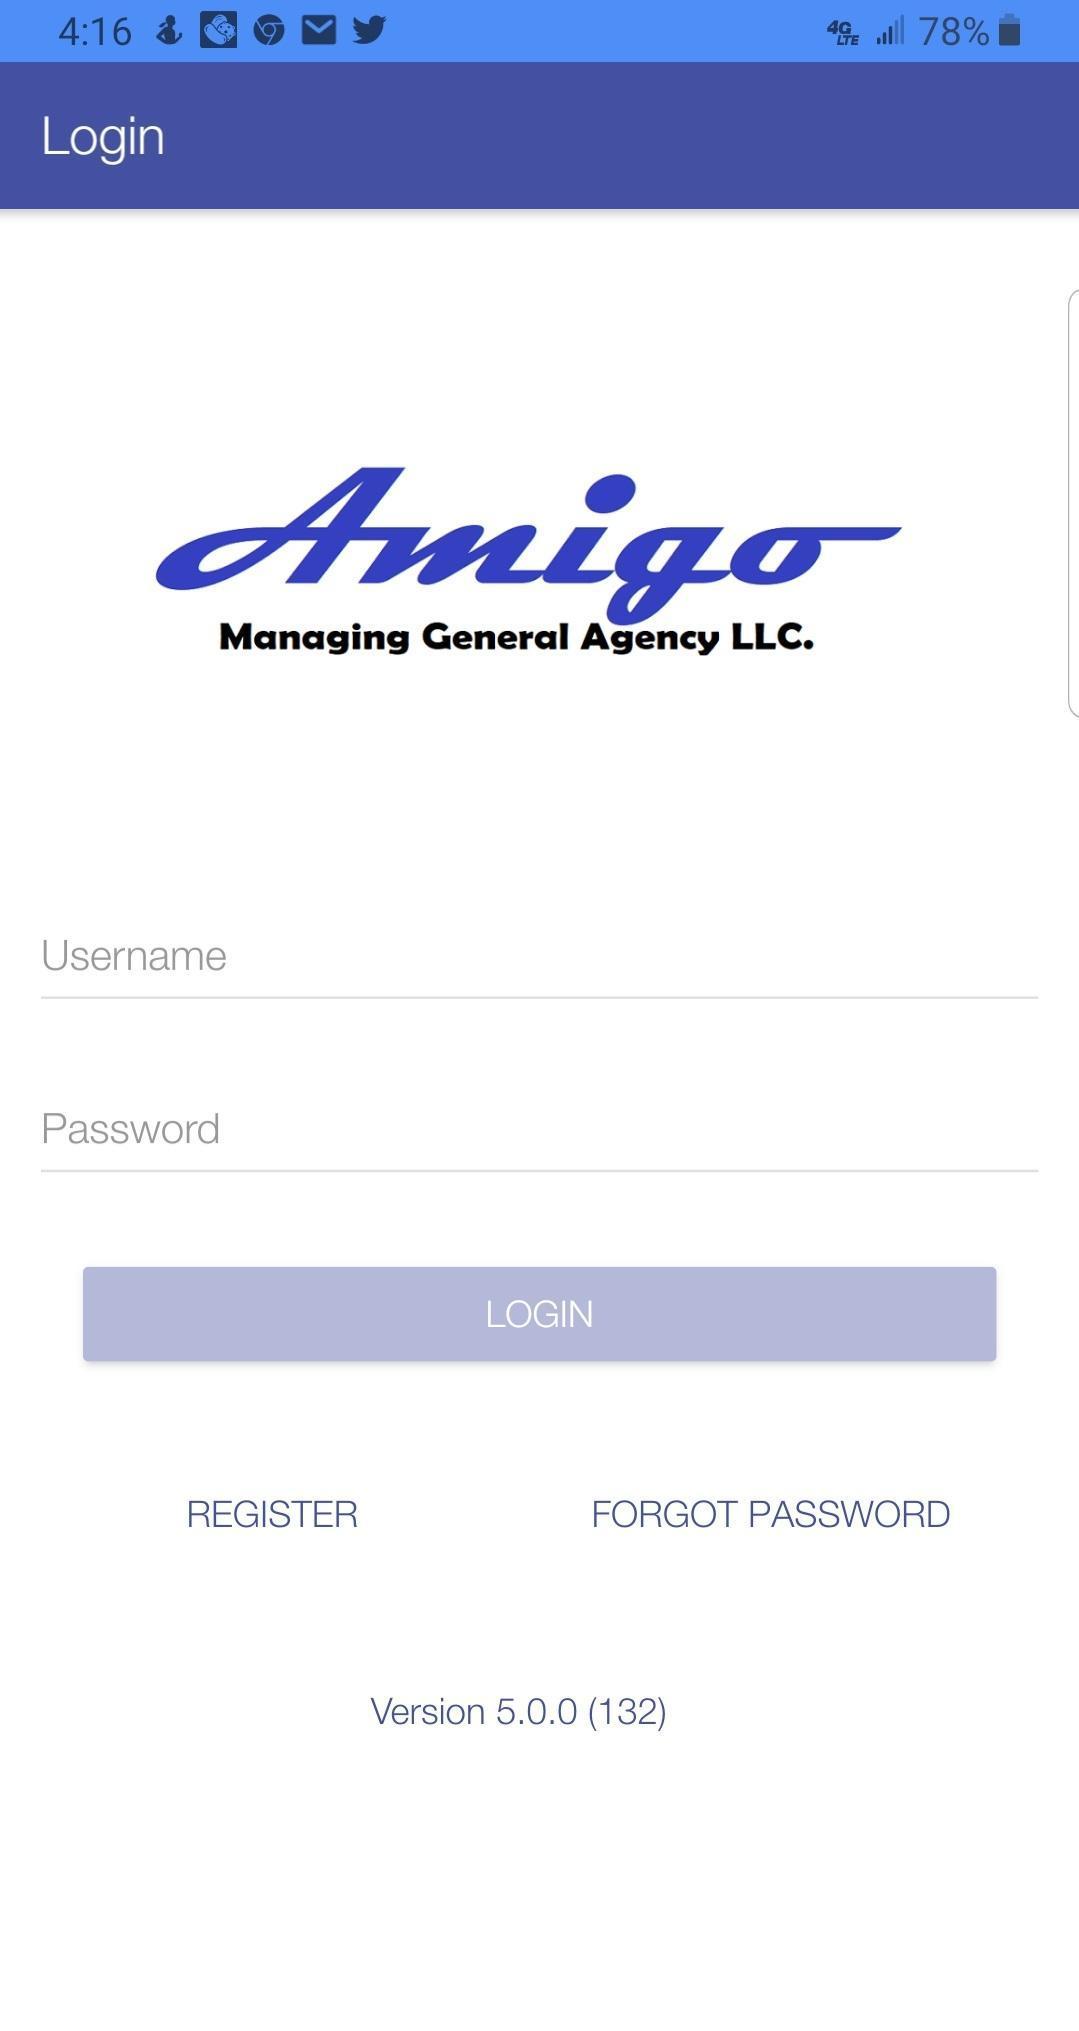 Customer Amigo Mga >> Amigo Mga Llc For Android Apk Download